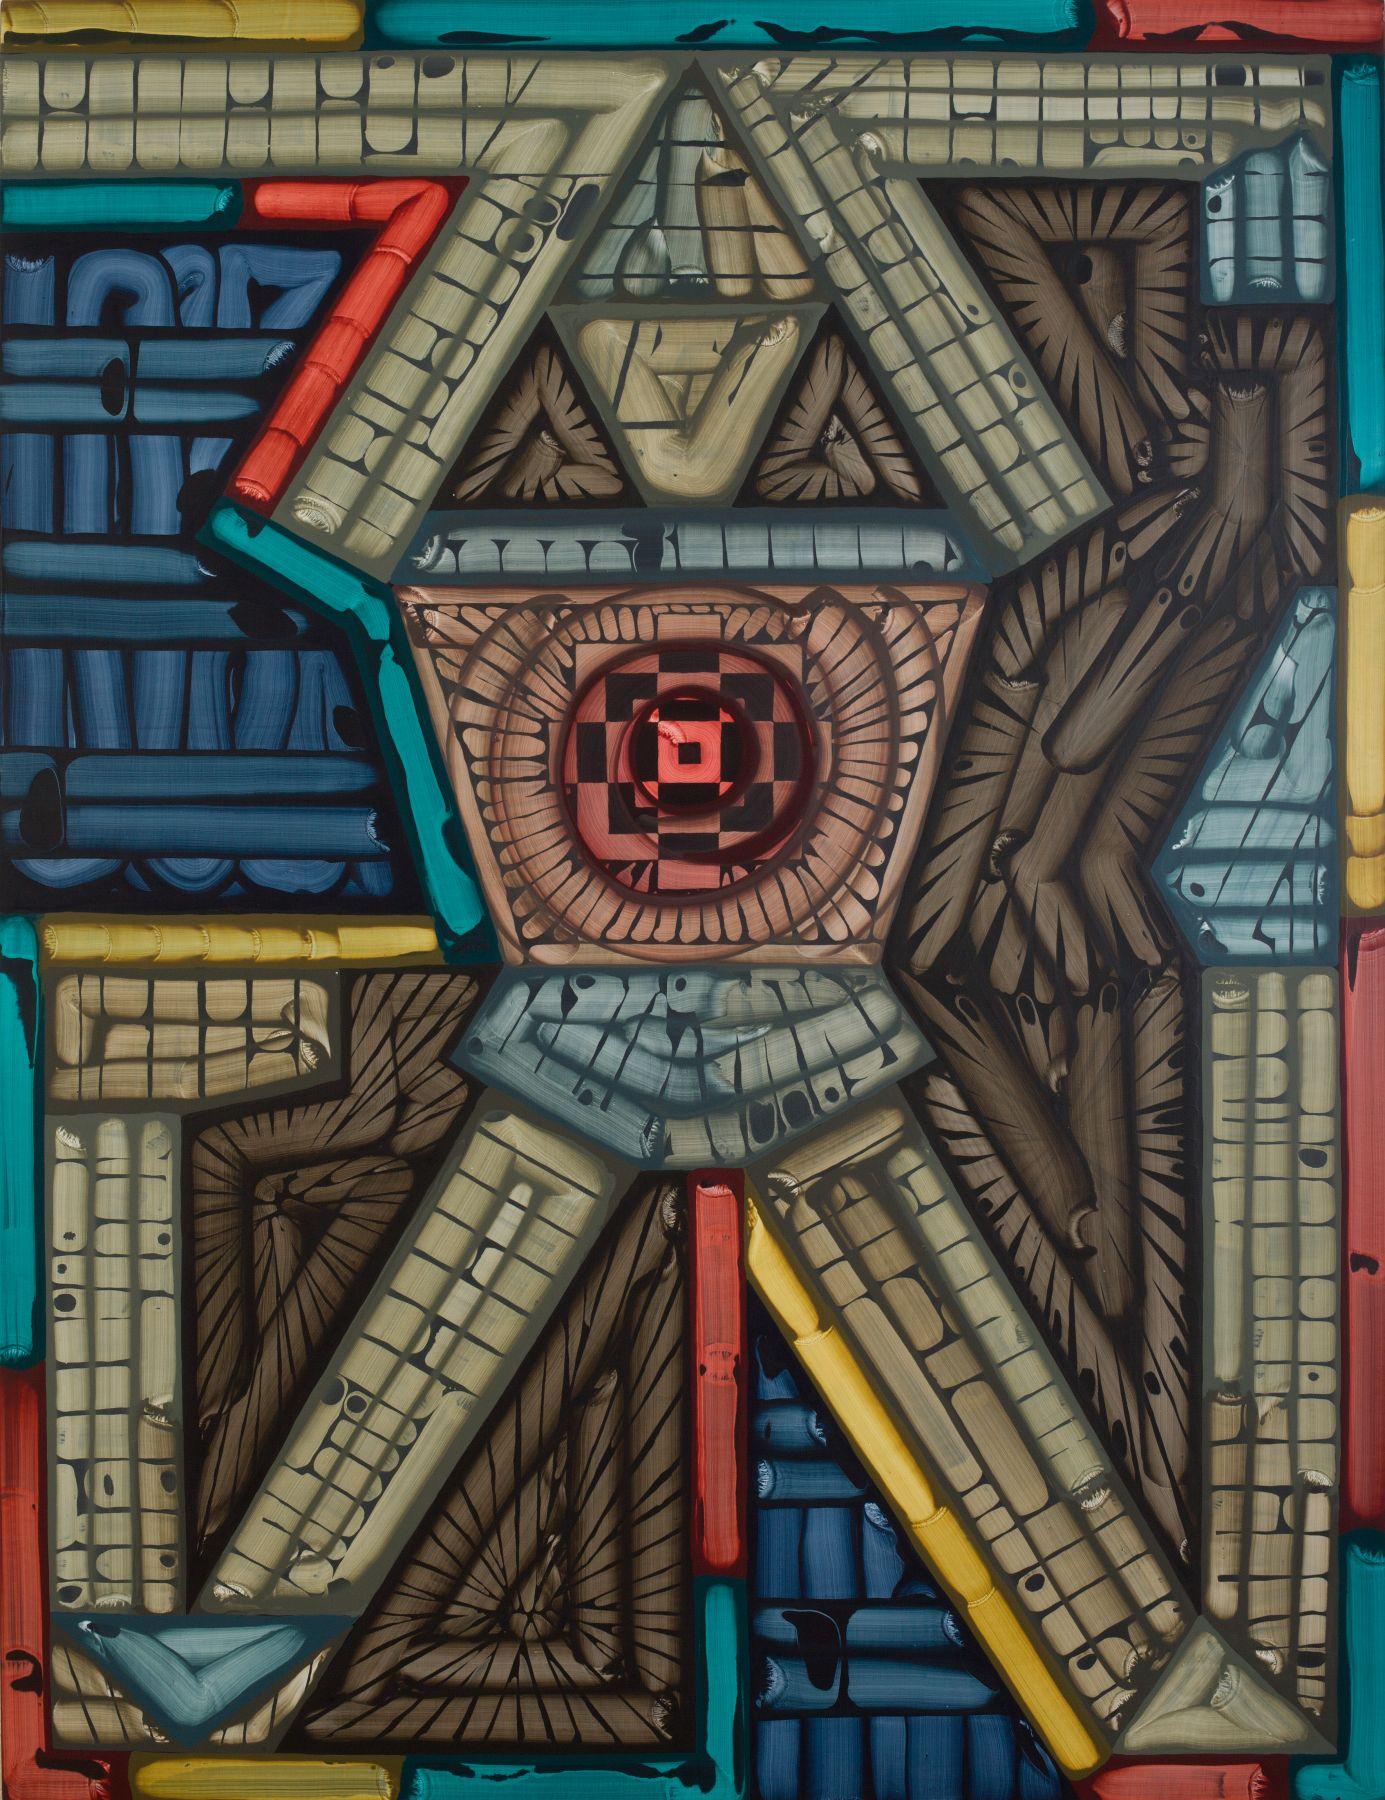 Nathan Redwood, Los Angeles, Artist, untitled miami beach, jack haley, basketball